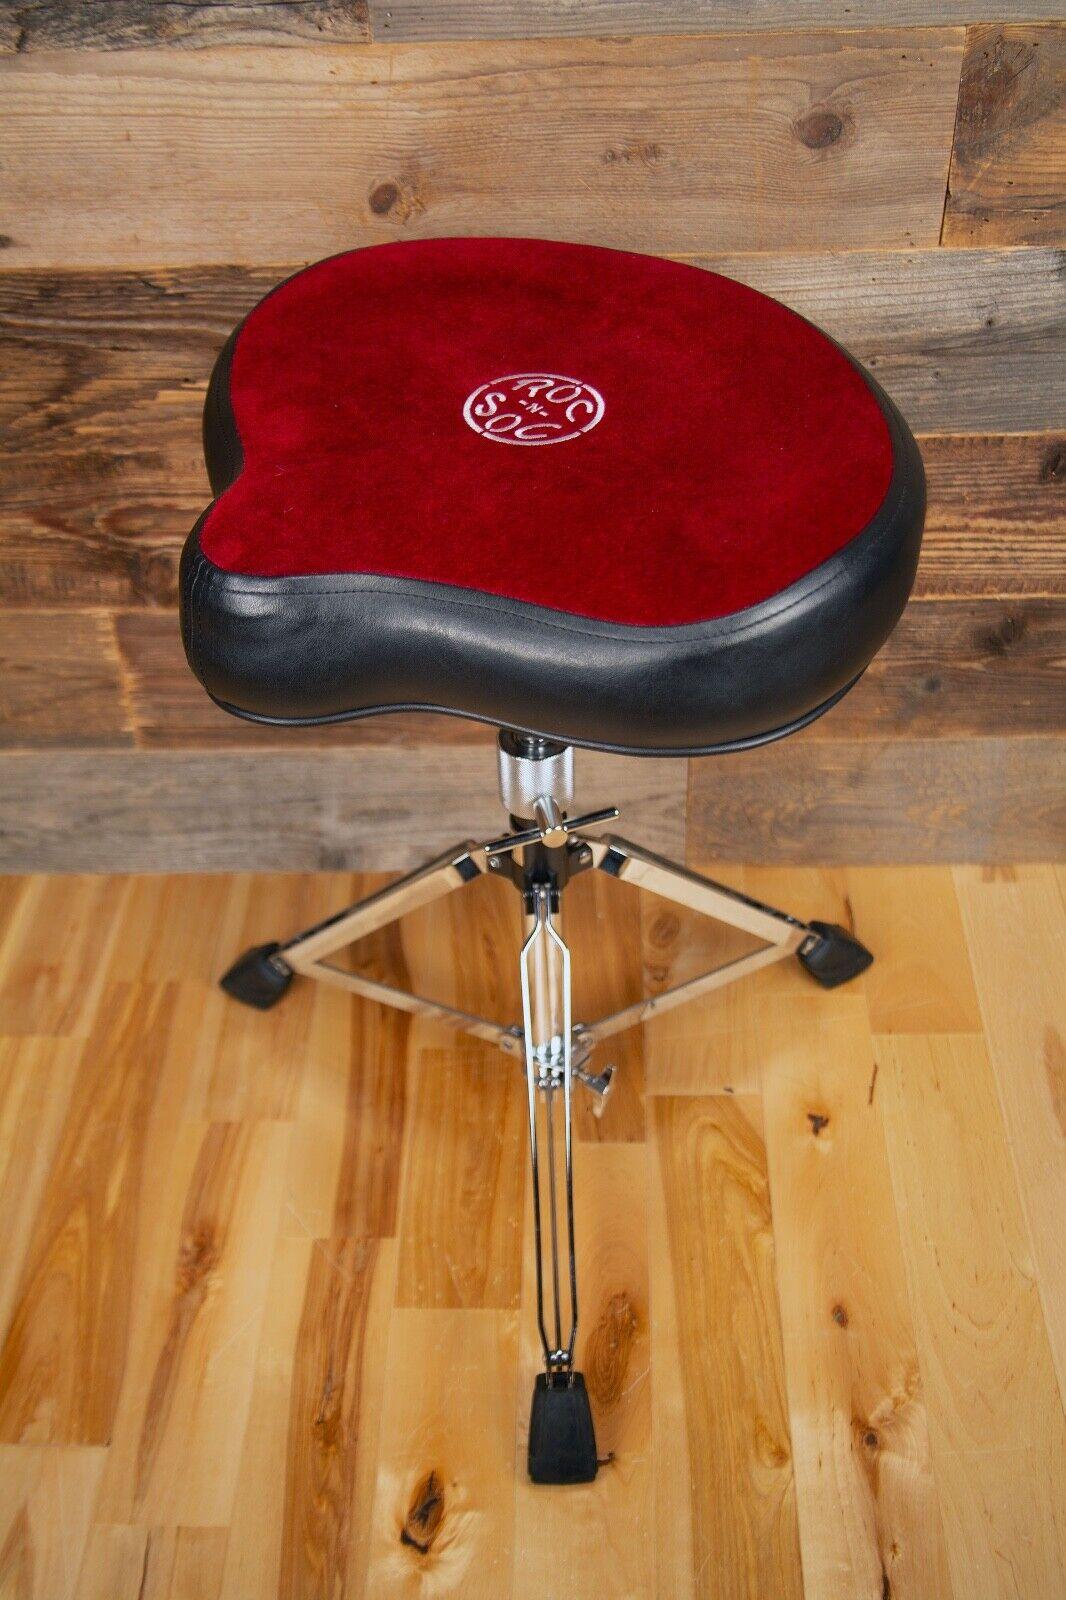 Roc N Soc Original Motor Cycle (Saddle) Drum Throne, Drum Stool, rot